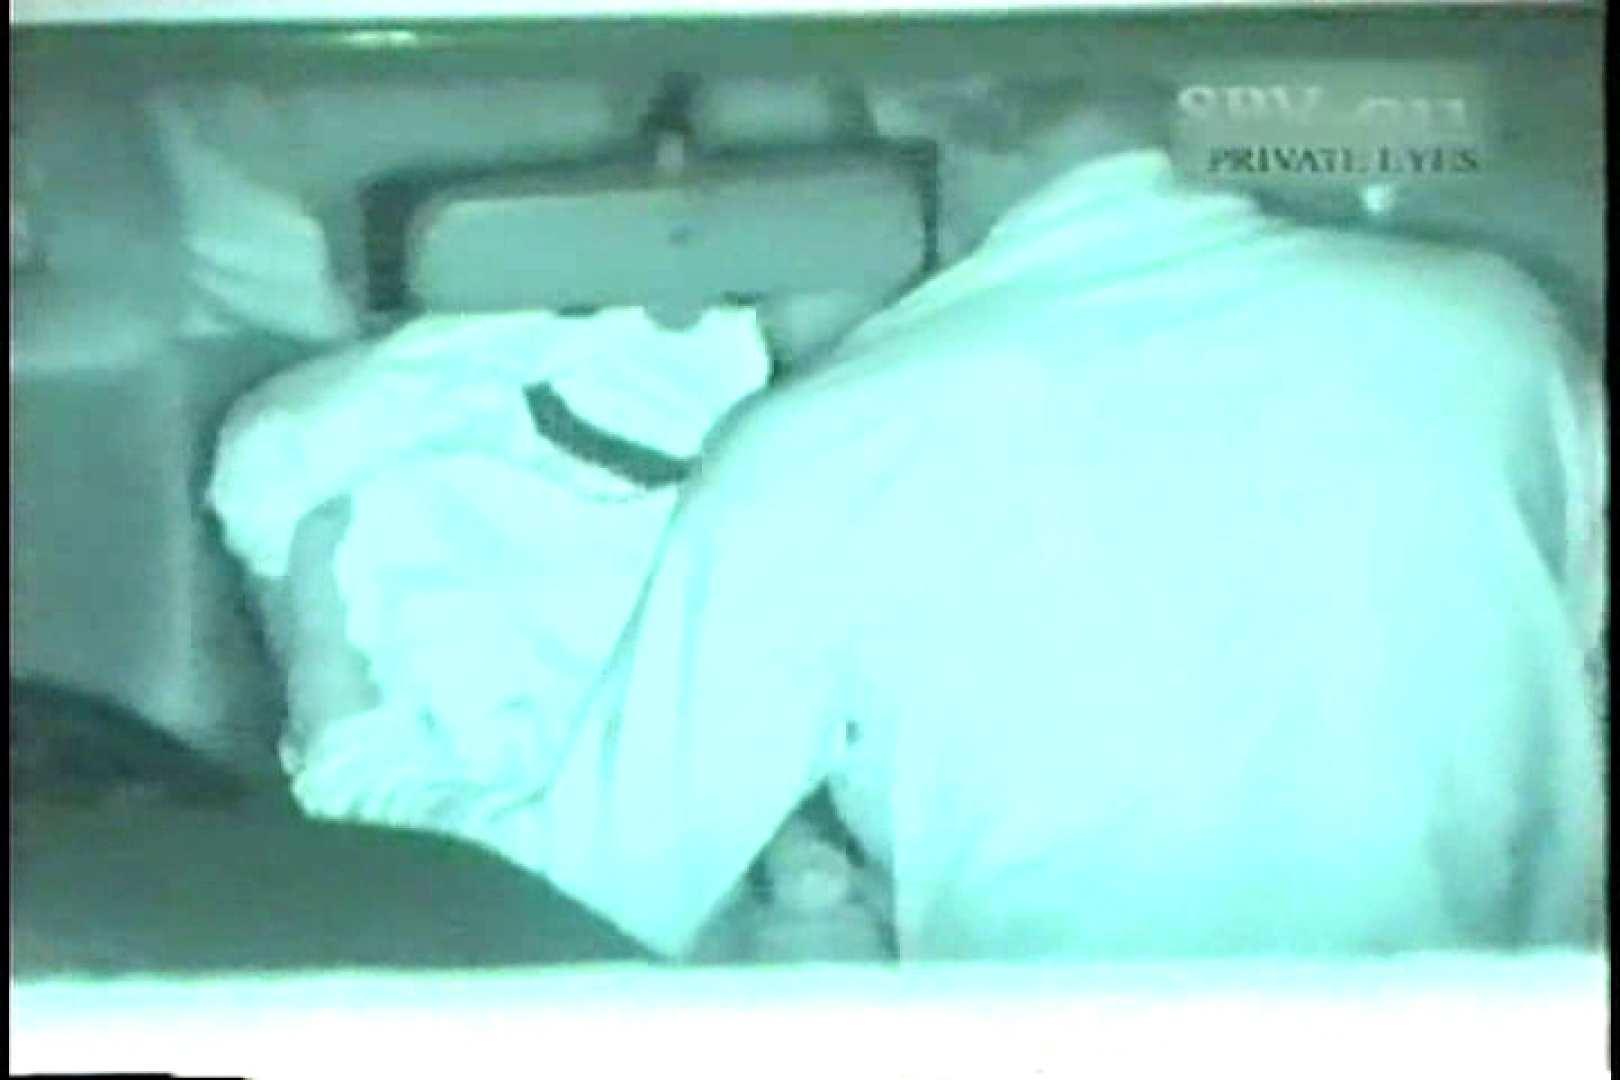 高画質版!SPD-011 盗撮 カーセックス黙示録 (VHS) 盗撮 濡れ場動画紹介 94連発 92